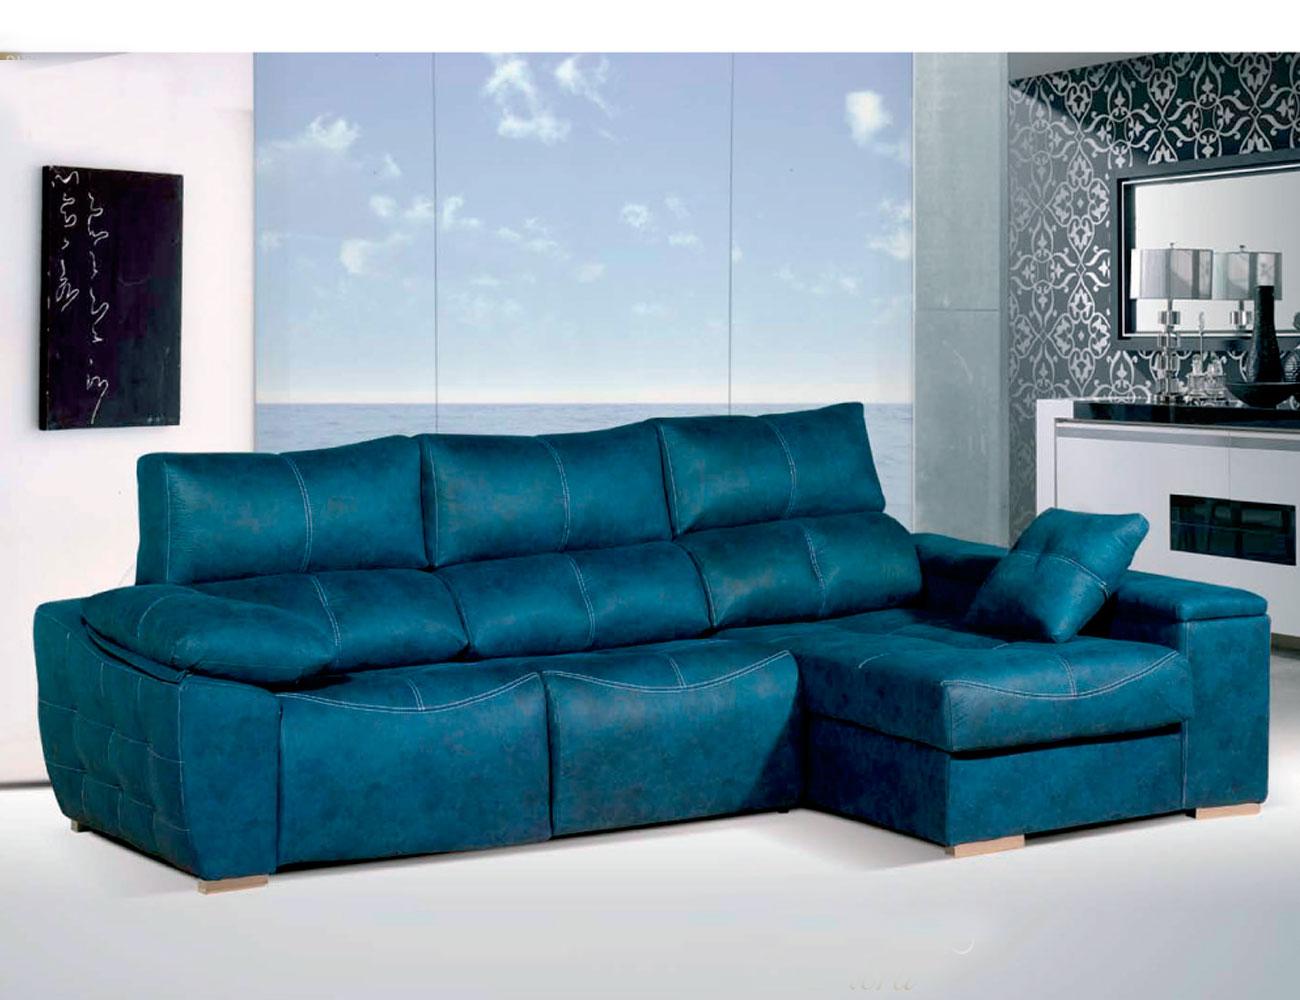 Sofa chaiselongue relax 2 motores anti manchas turquesa51